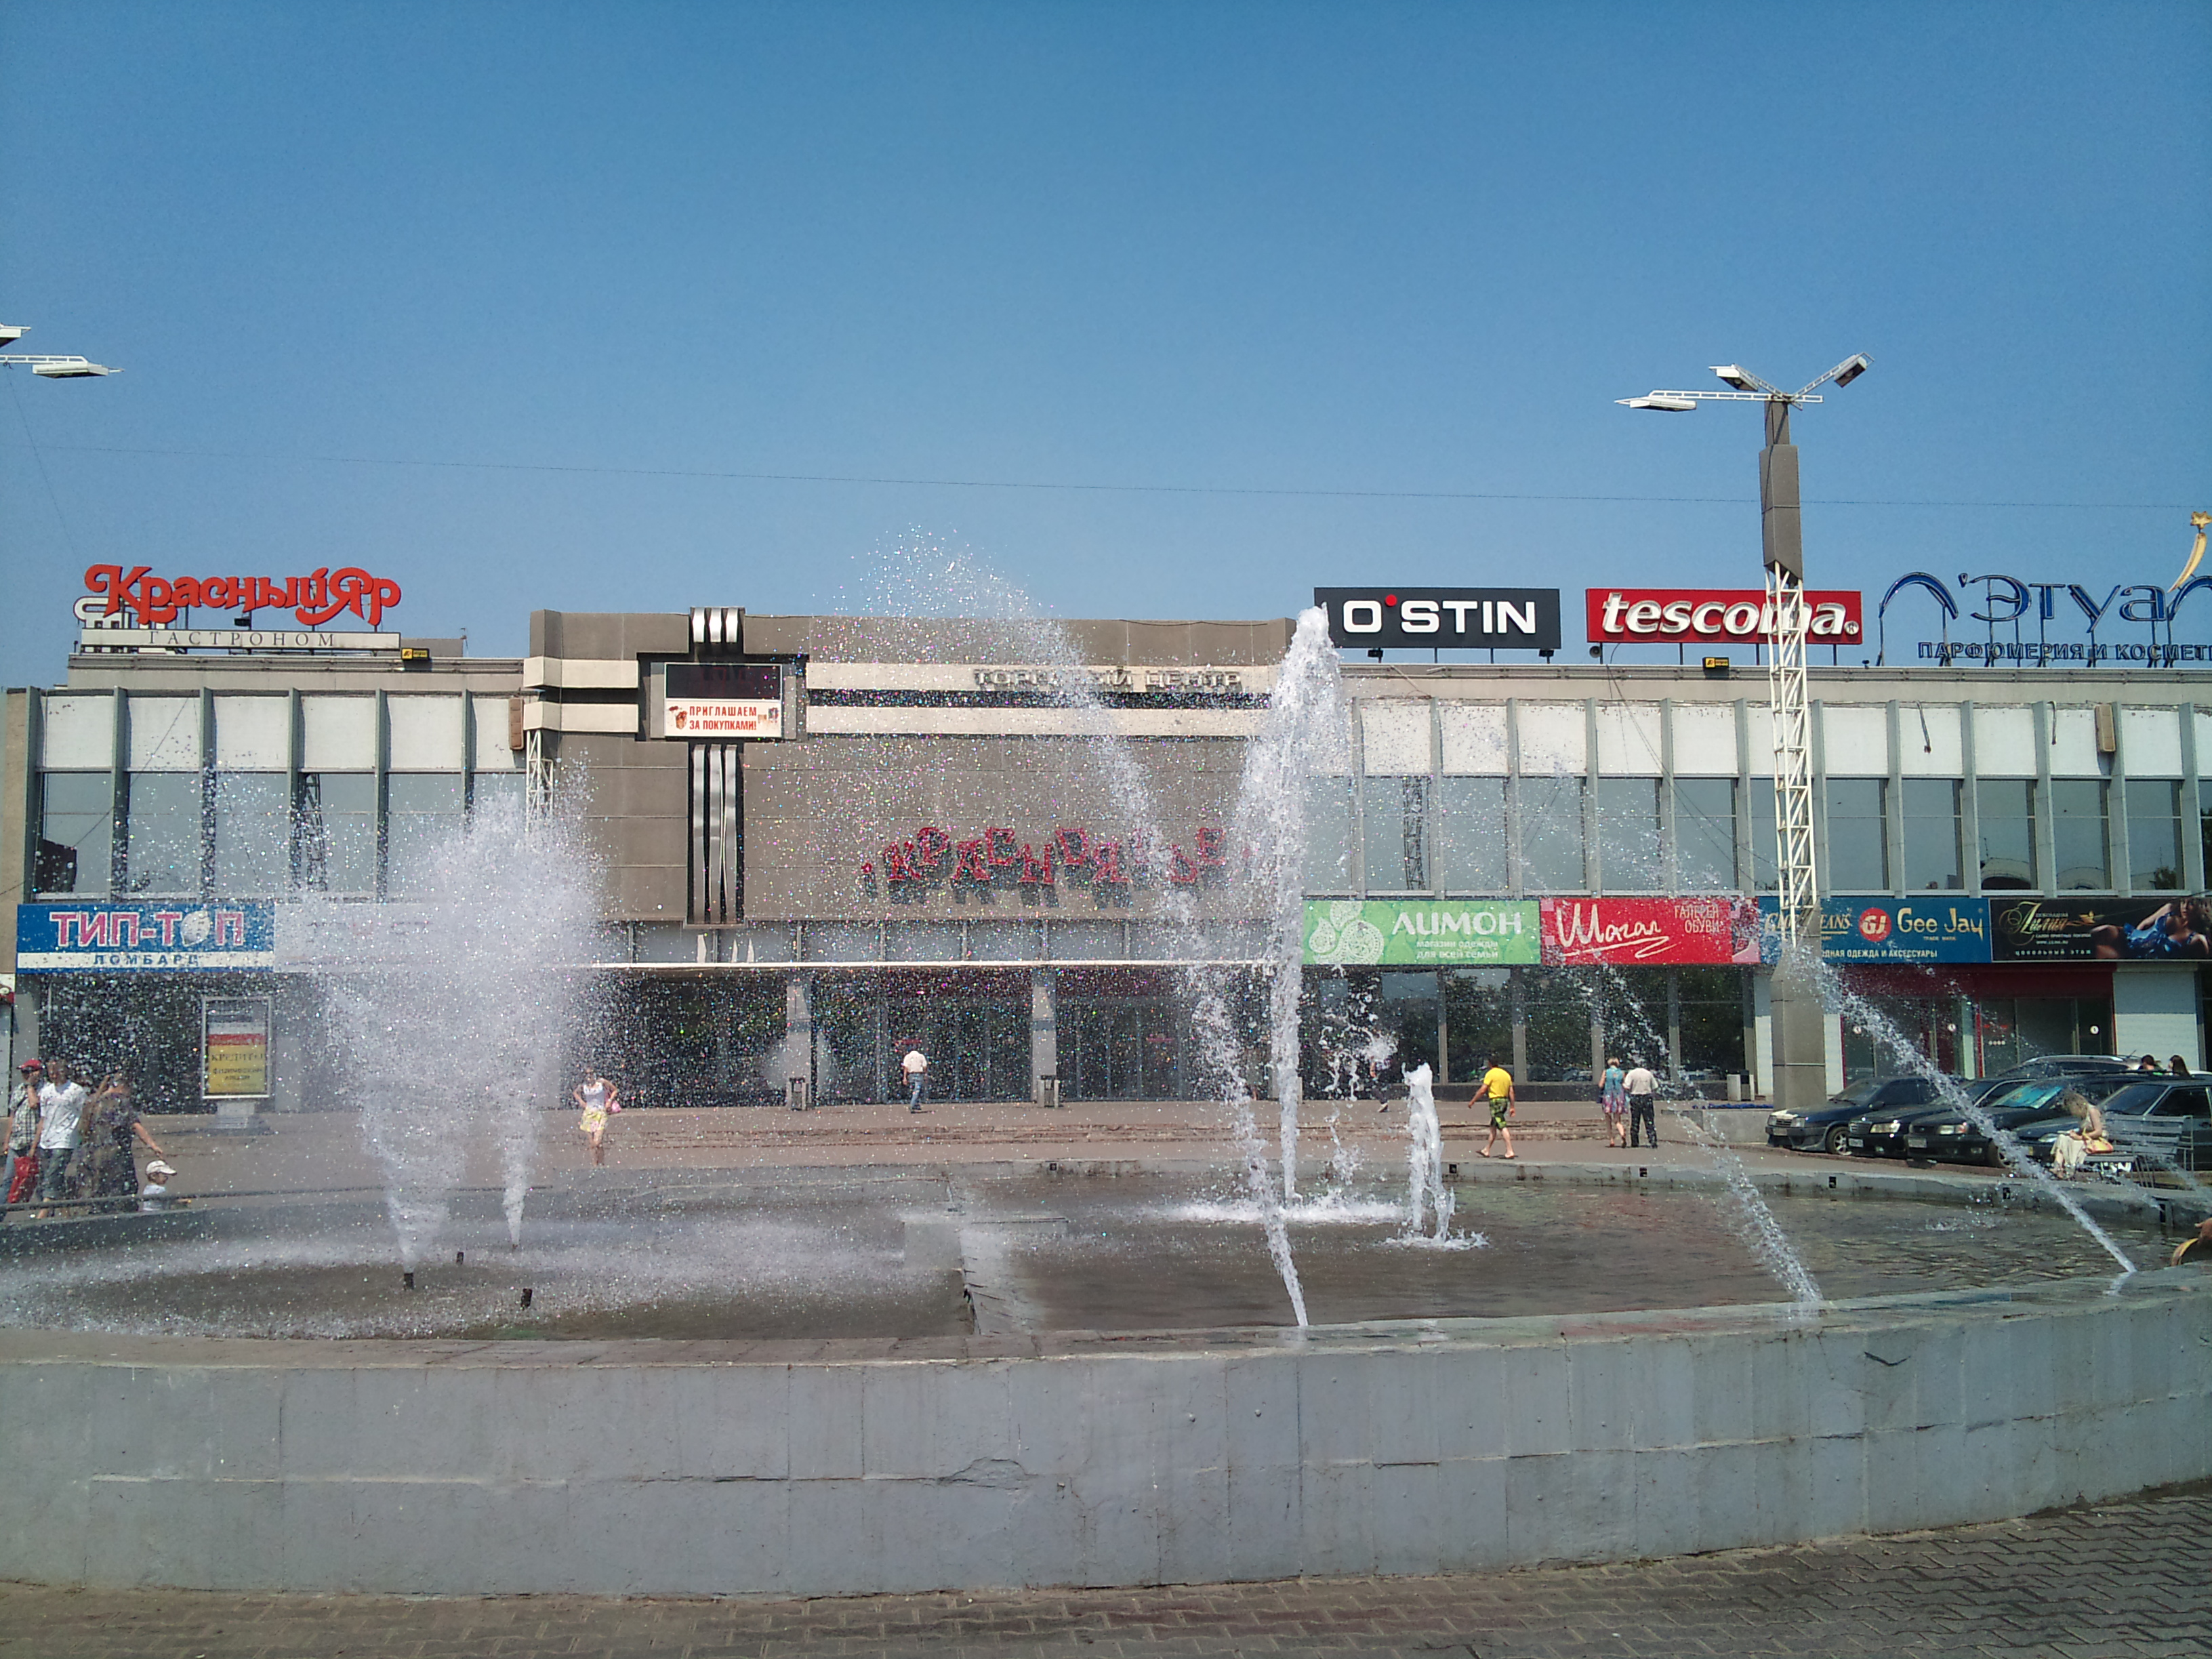 Красноярск фонтан напротив ТЦ Красноярье. 26.06.2012 года